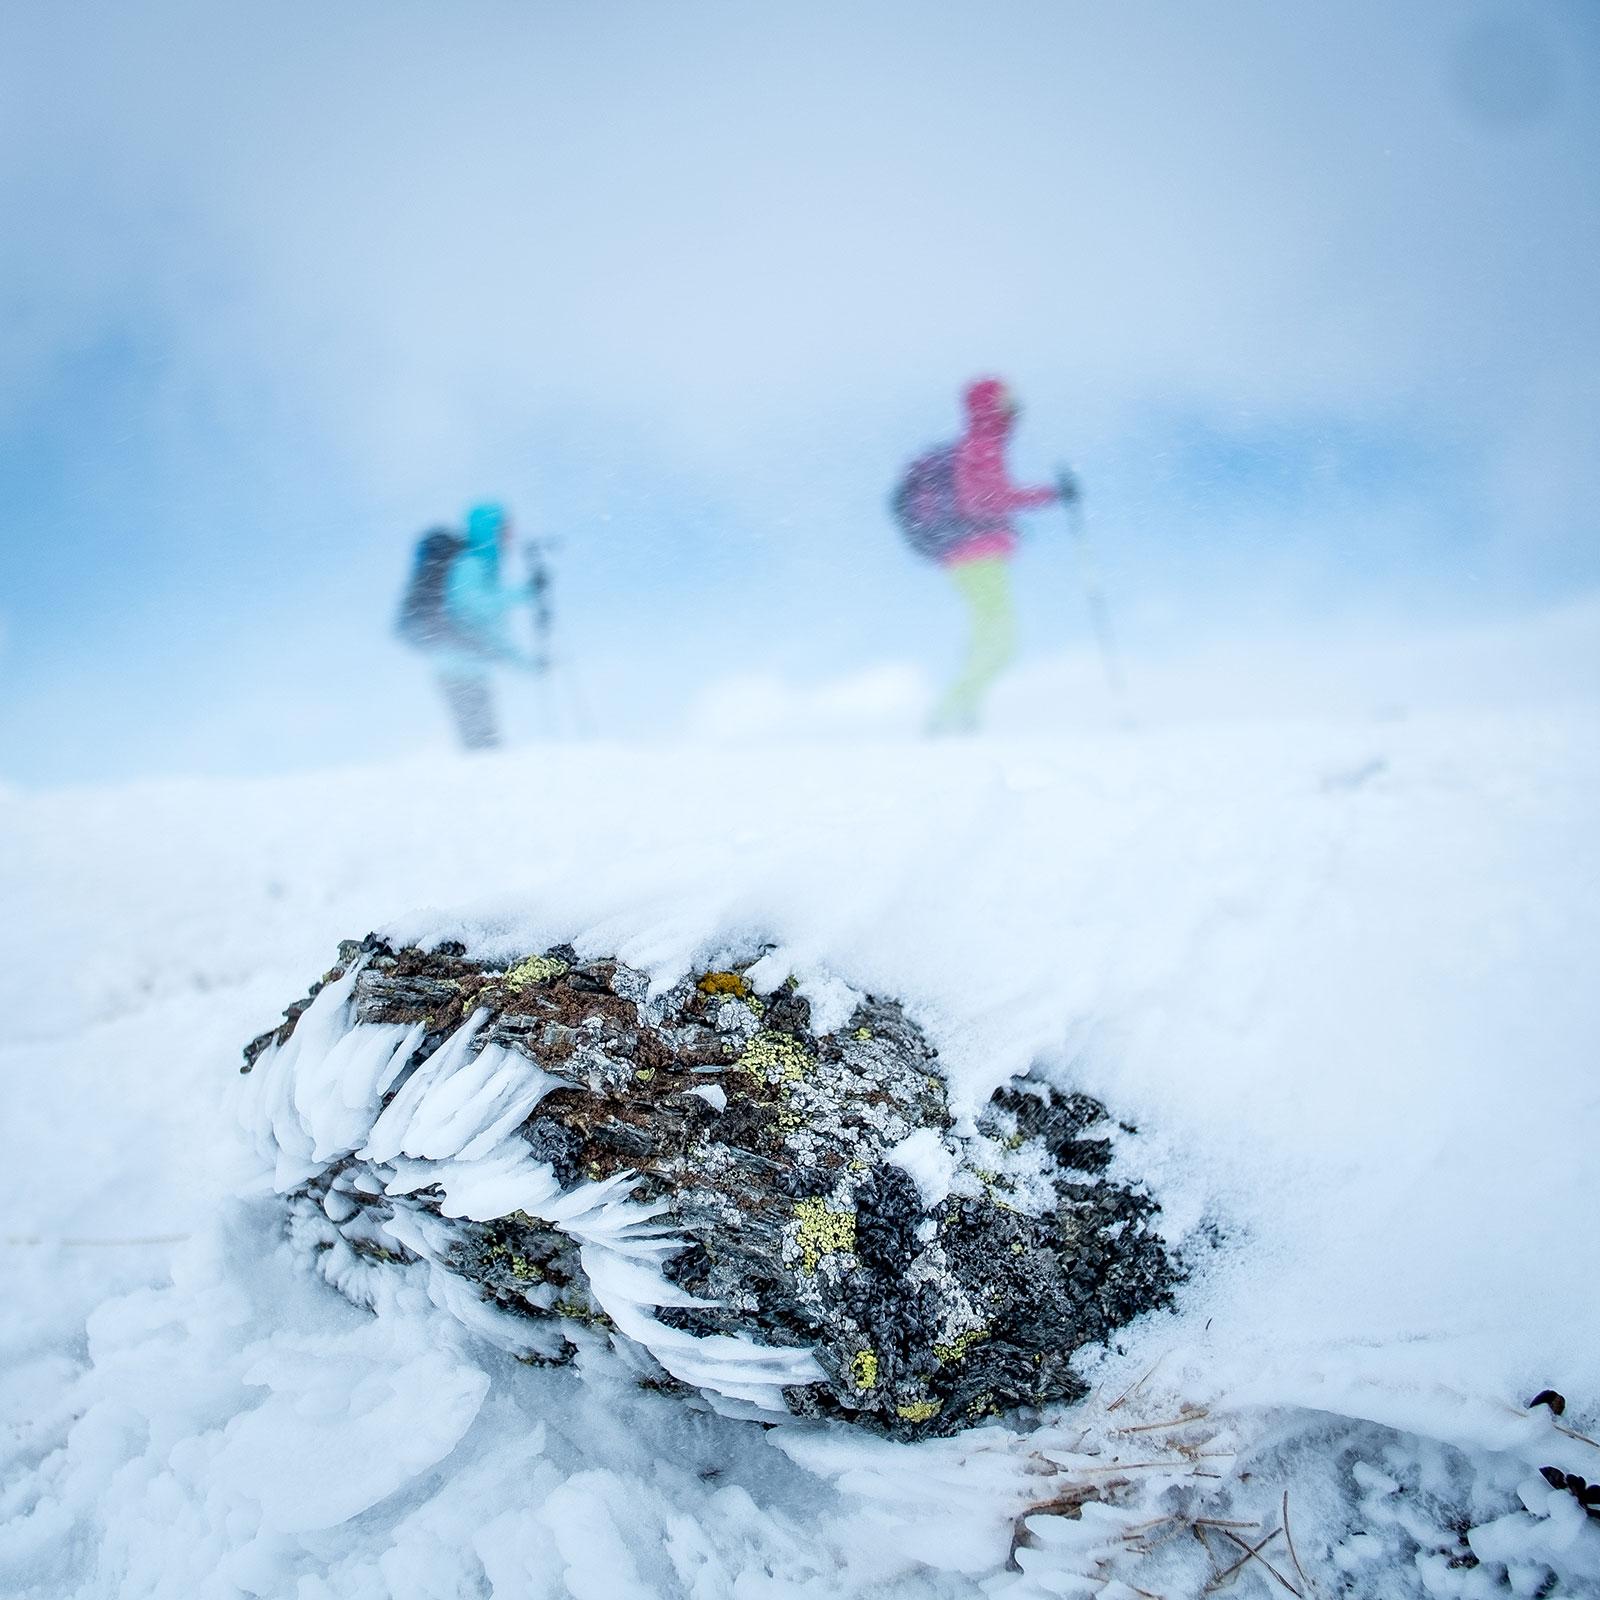 Eiskristall. Skitour in Südtirol | Pauli Trenkwalder, Berge & Psychologie